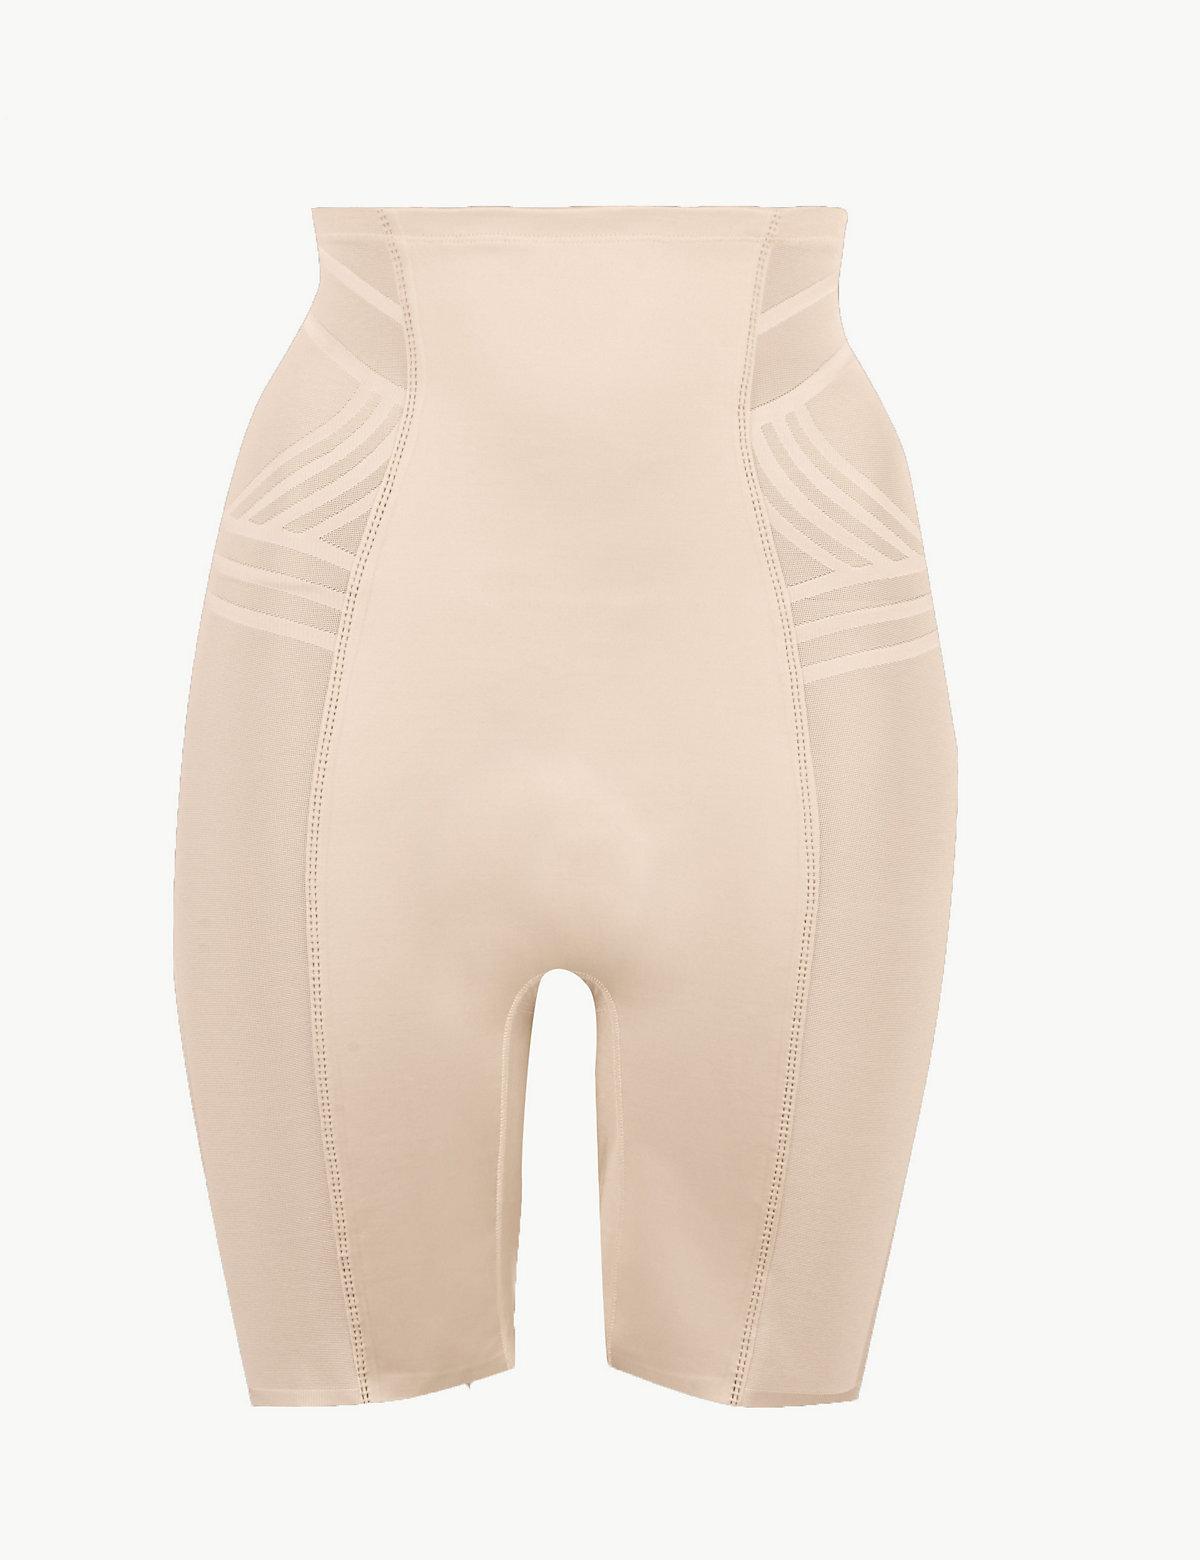 3b249011bd5cb M S Collection Firm Control Magicwear Geometric Waist   Thigh Cincher